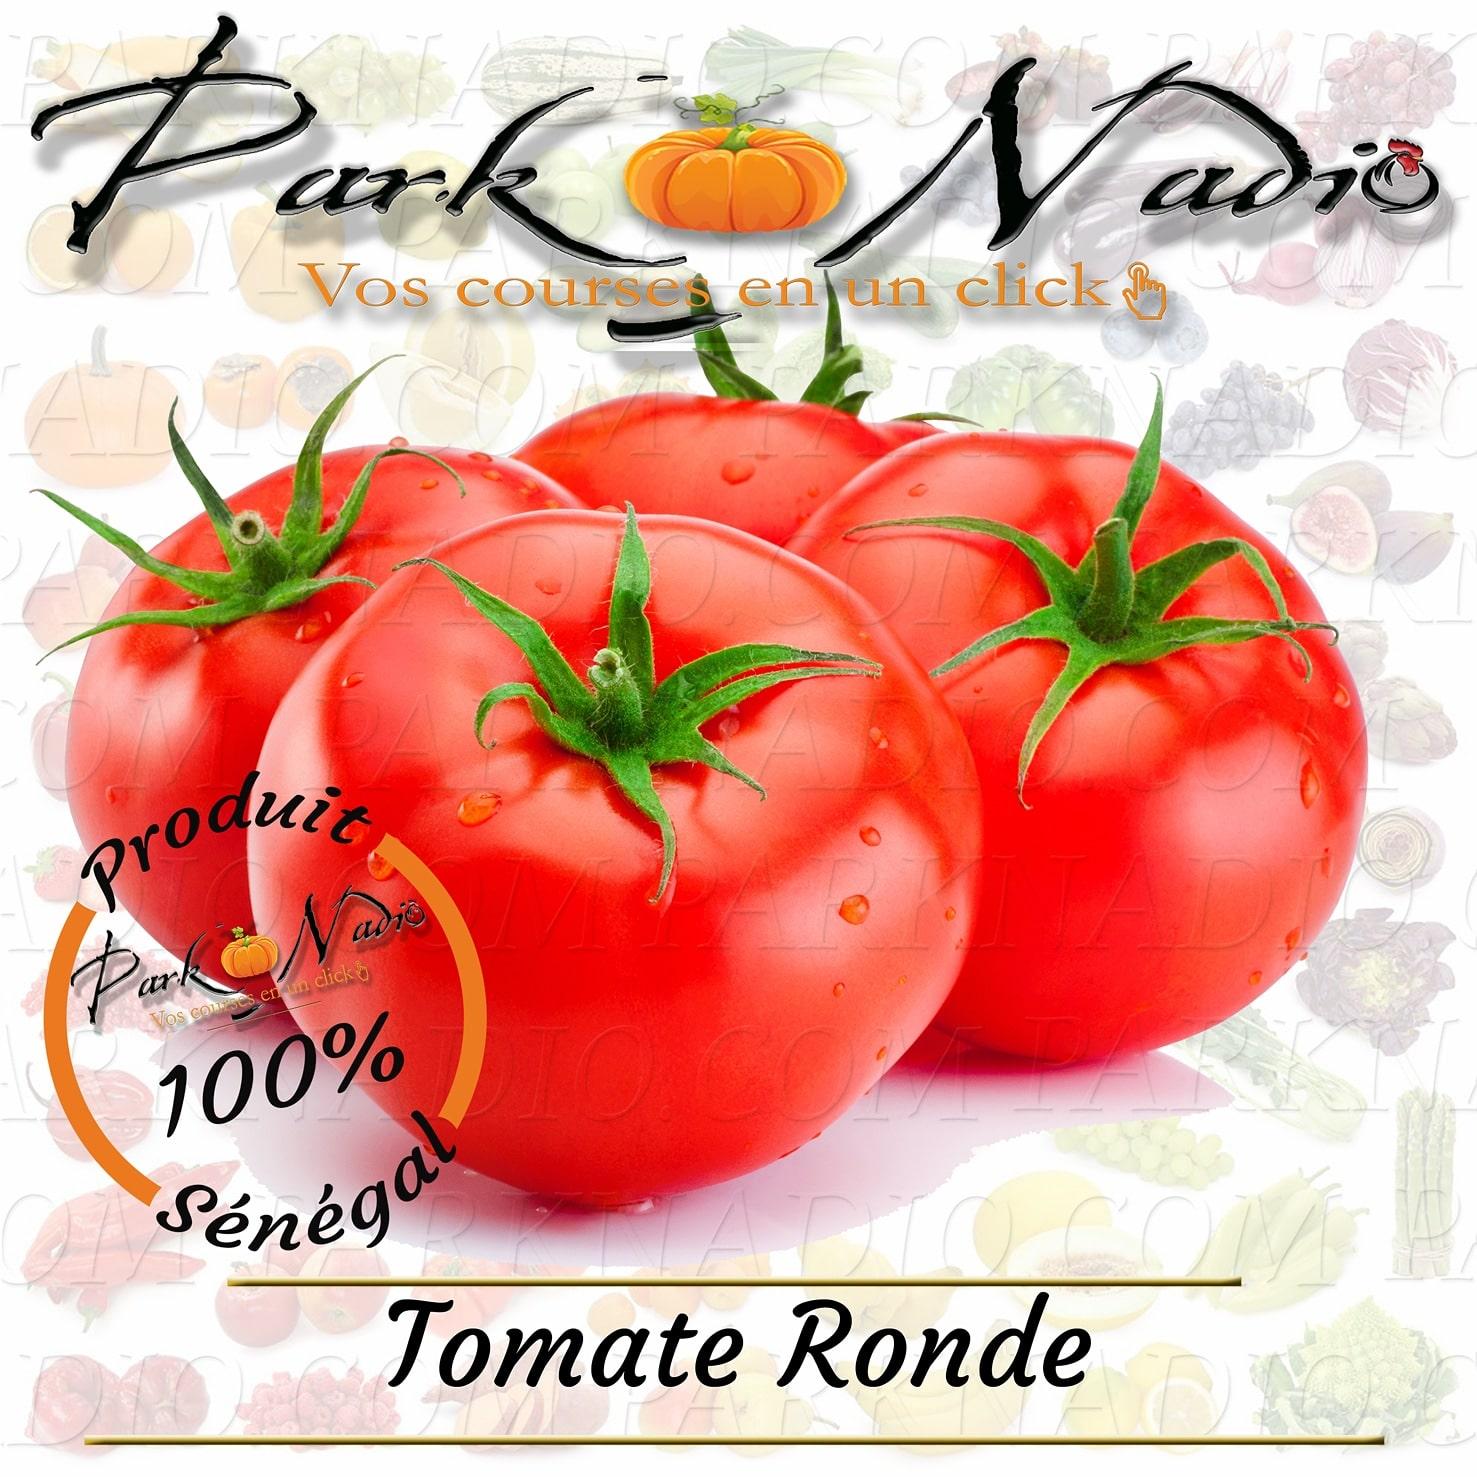 Tomate Marche en ligne a Dakar